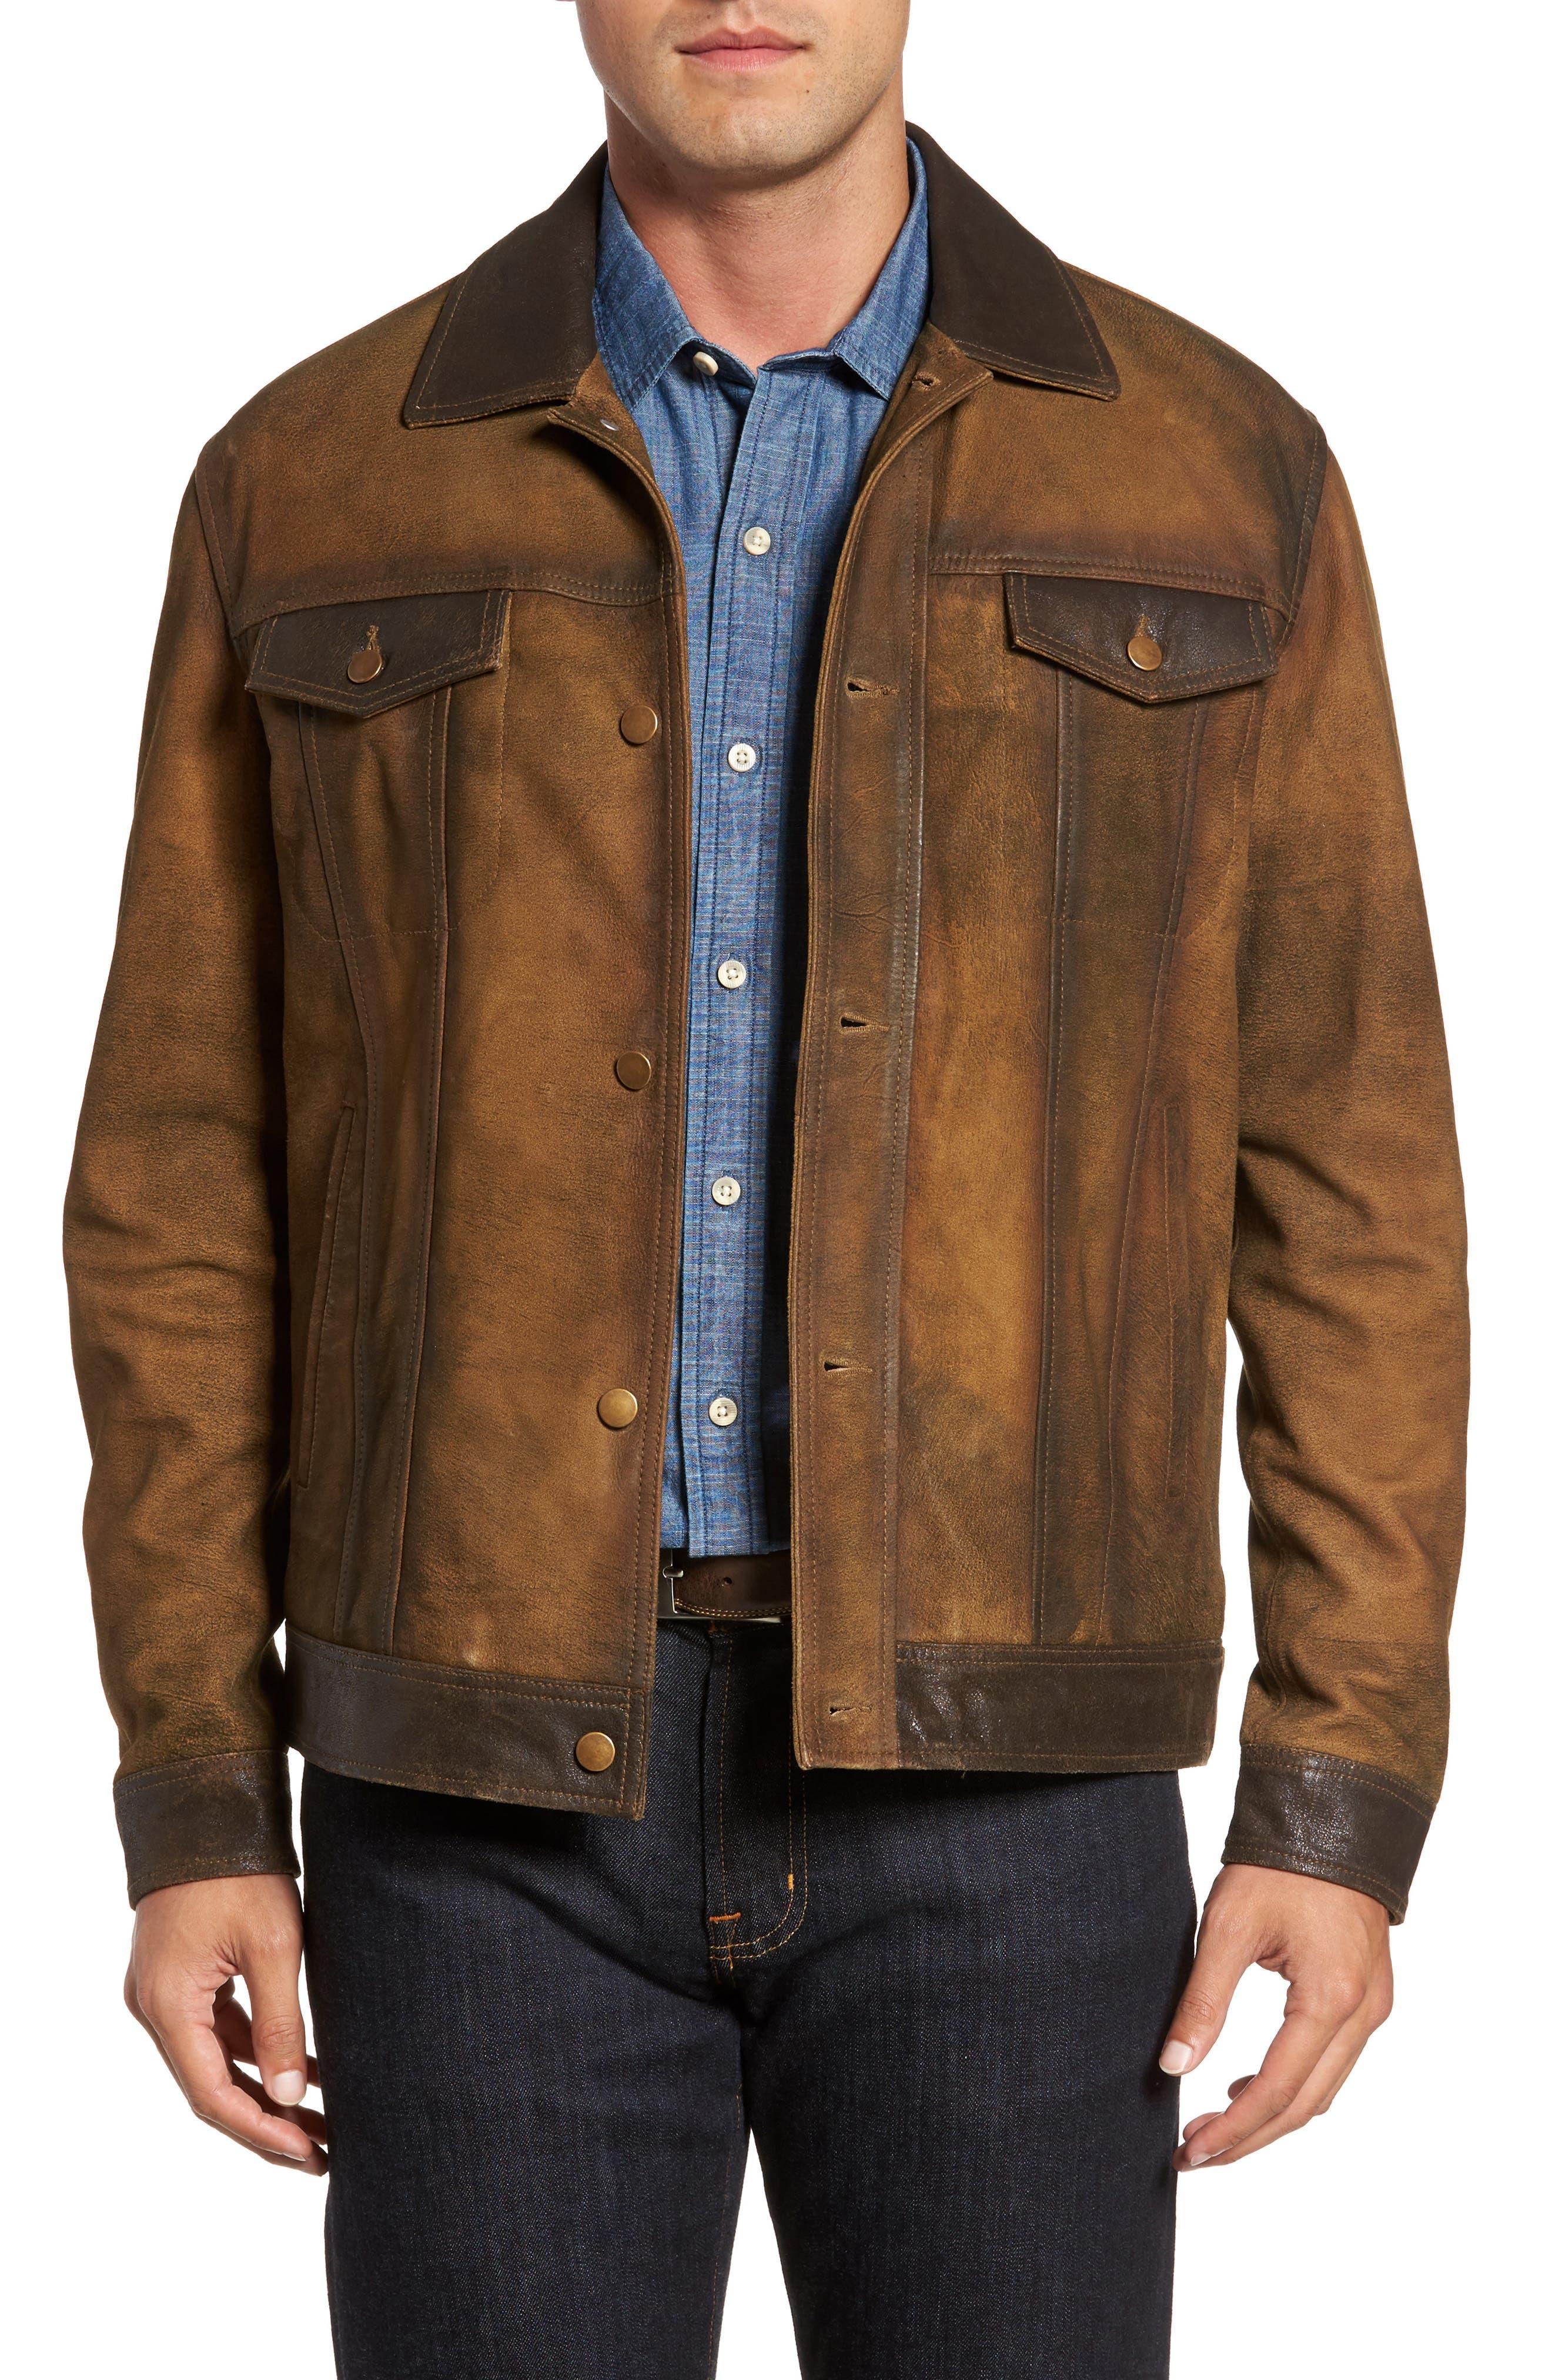 Alternate Image 1 Selected - FLYNT Distressed Leather Trucker Jacket